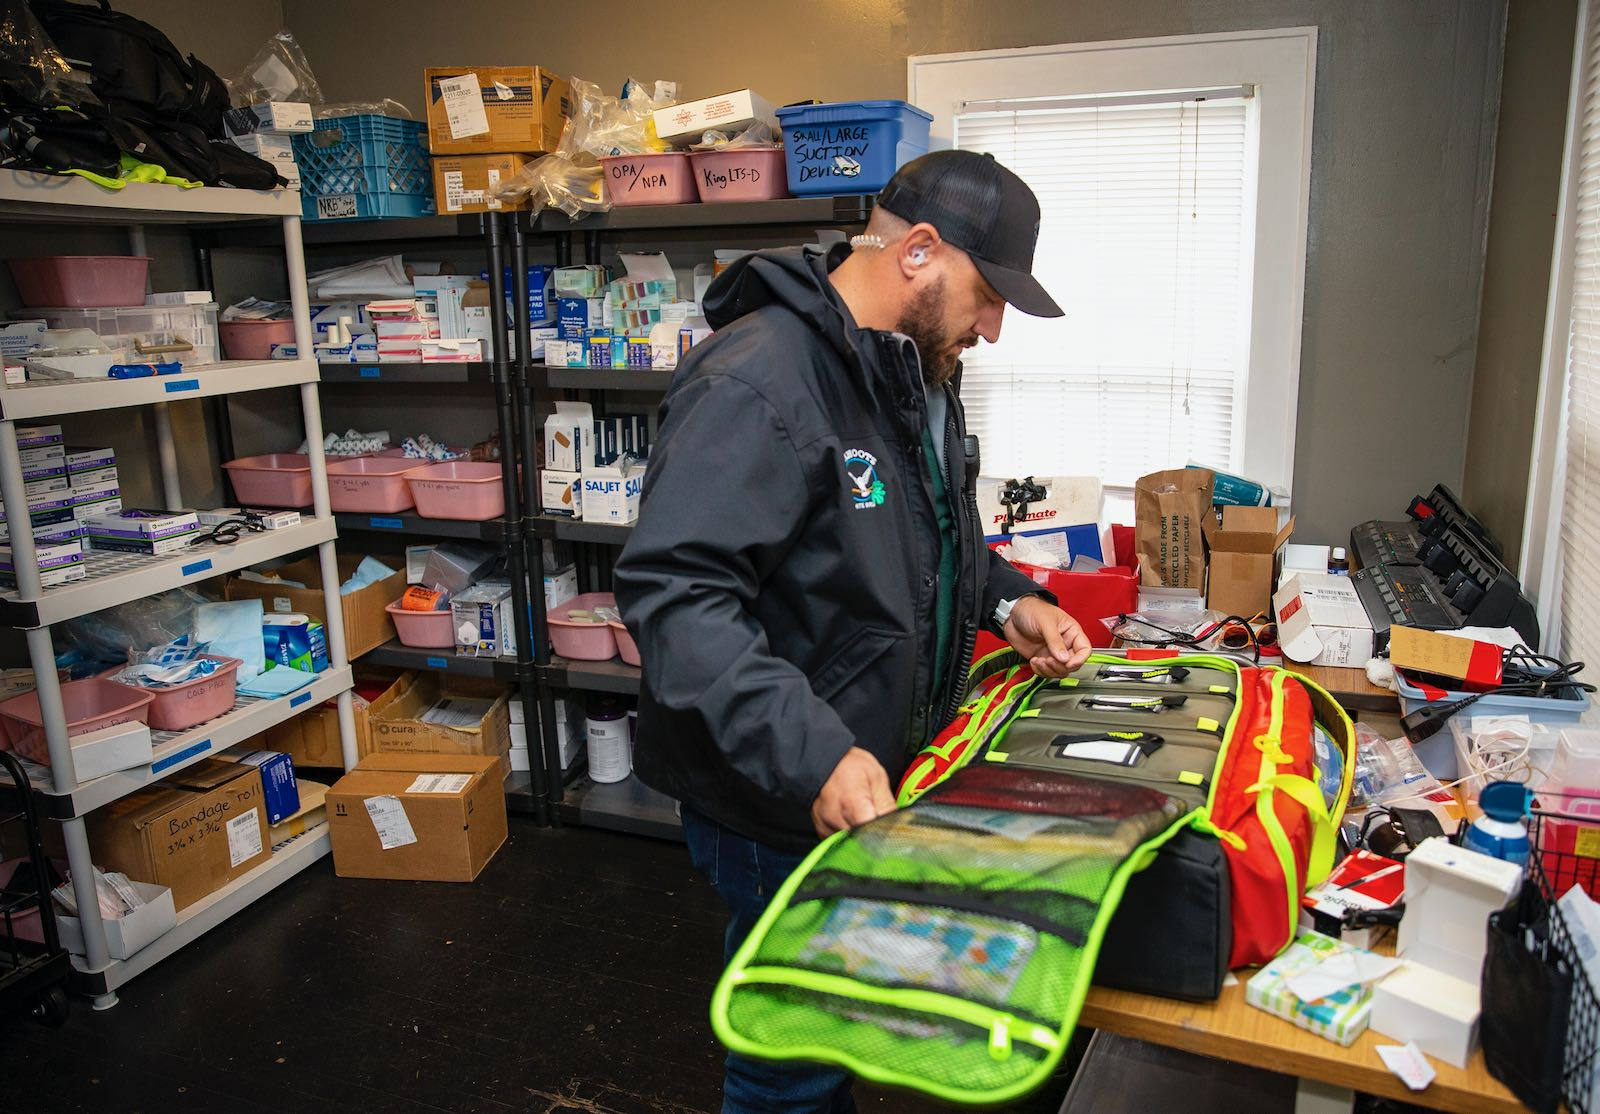 A emergency worker checks his medical kit, Eugene, Oregon